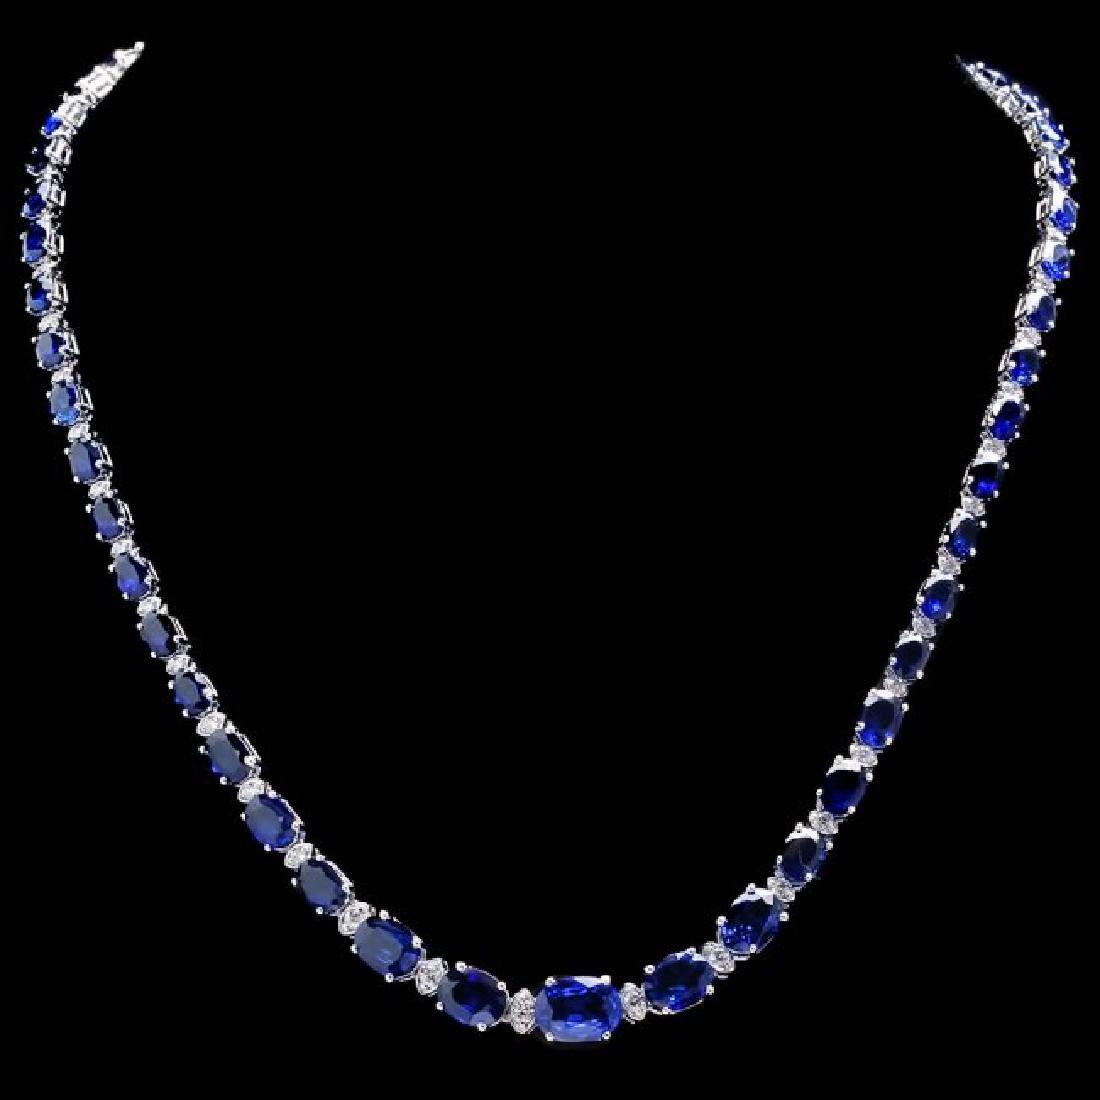 14k Gold 32.50ct Sapphire 1.55ct Diamond Necklace